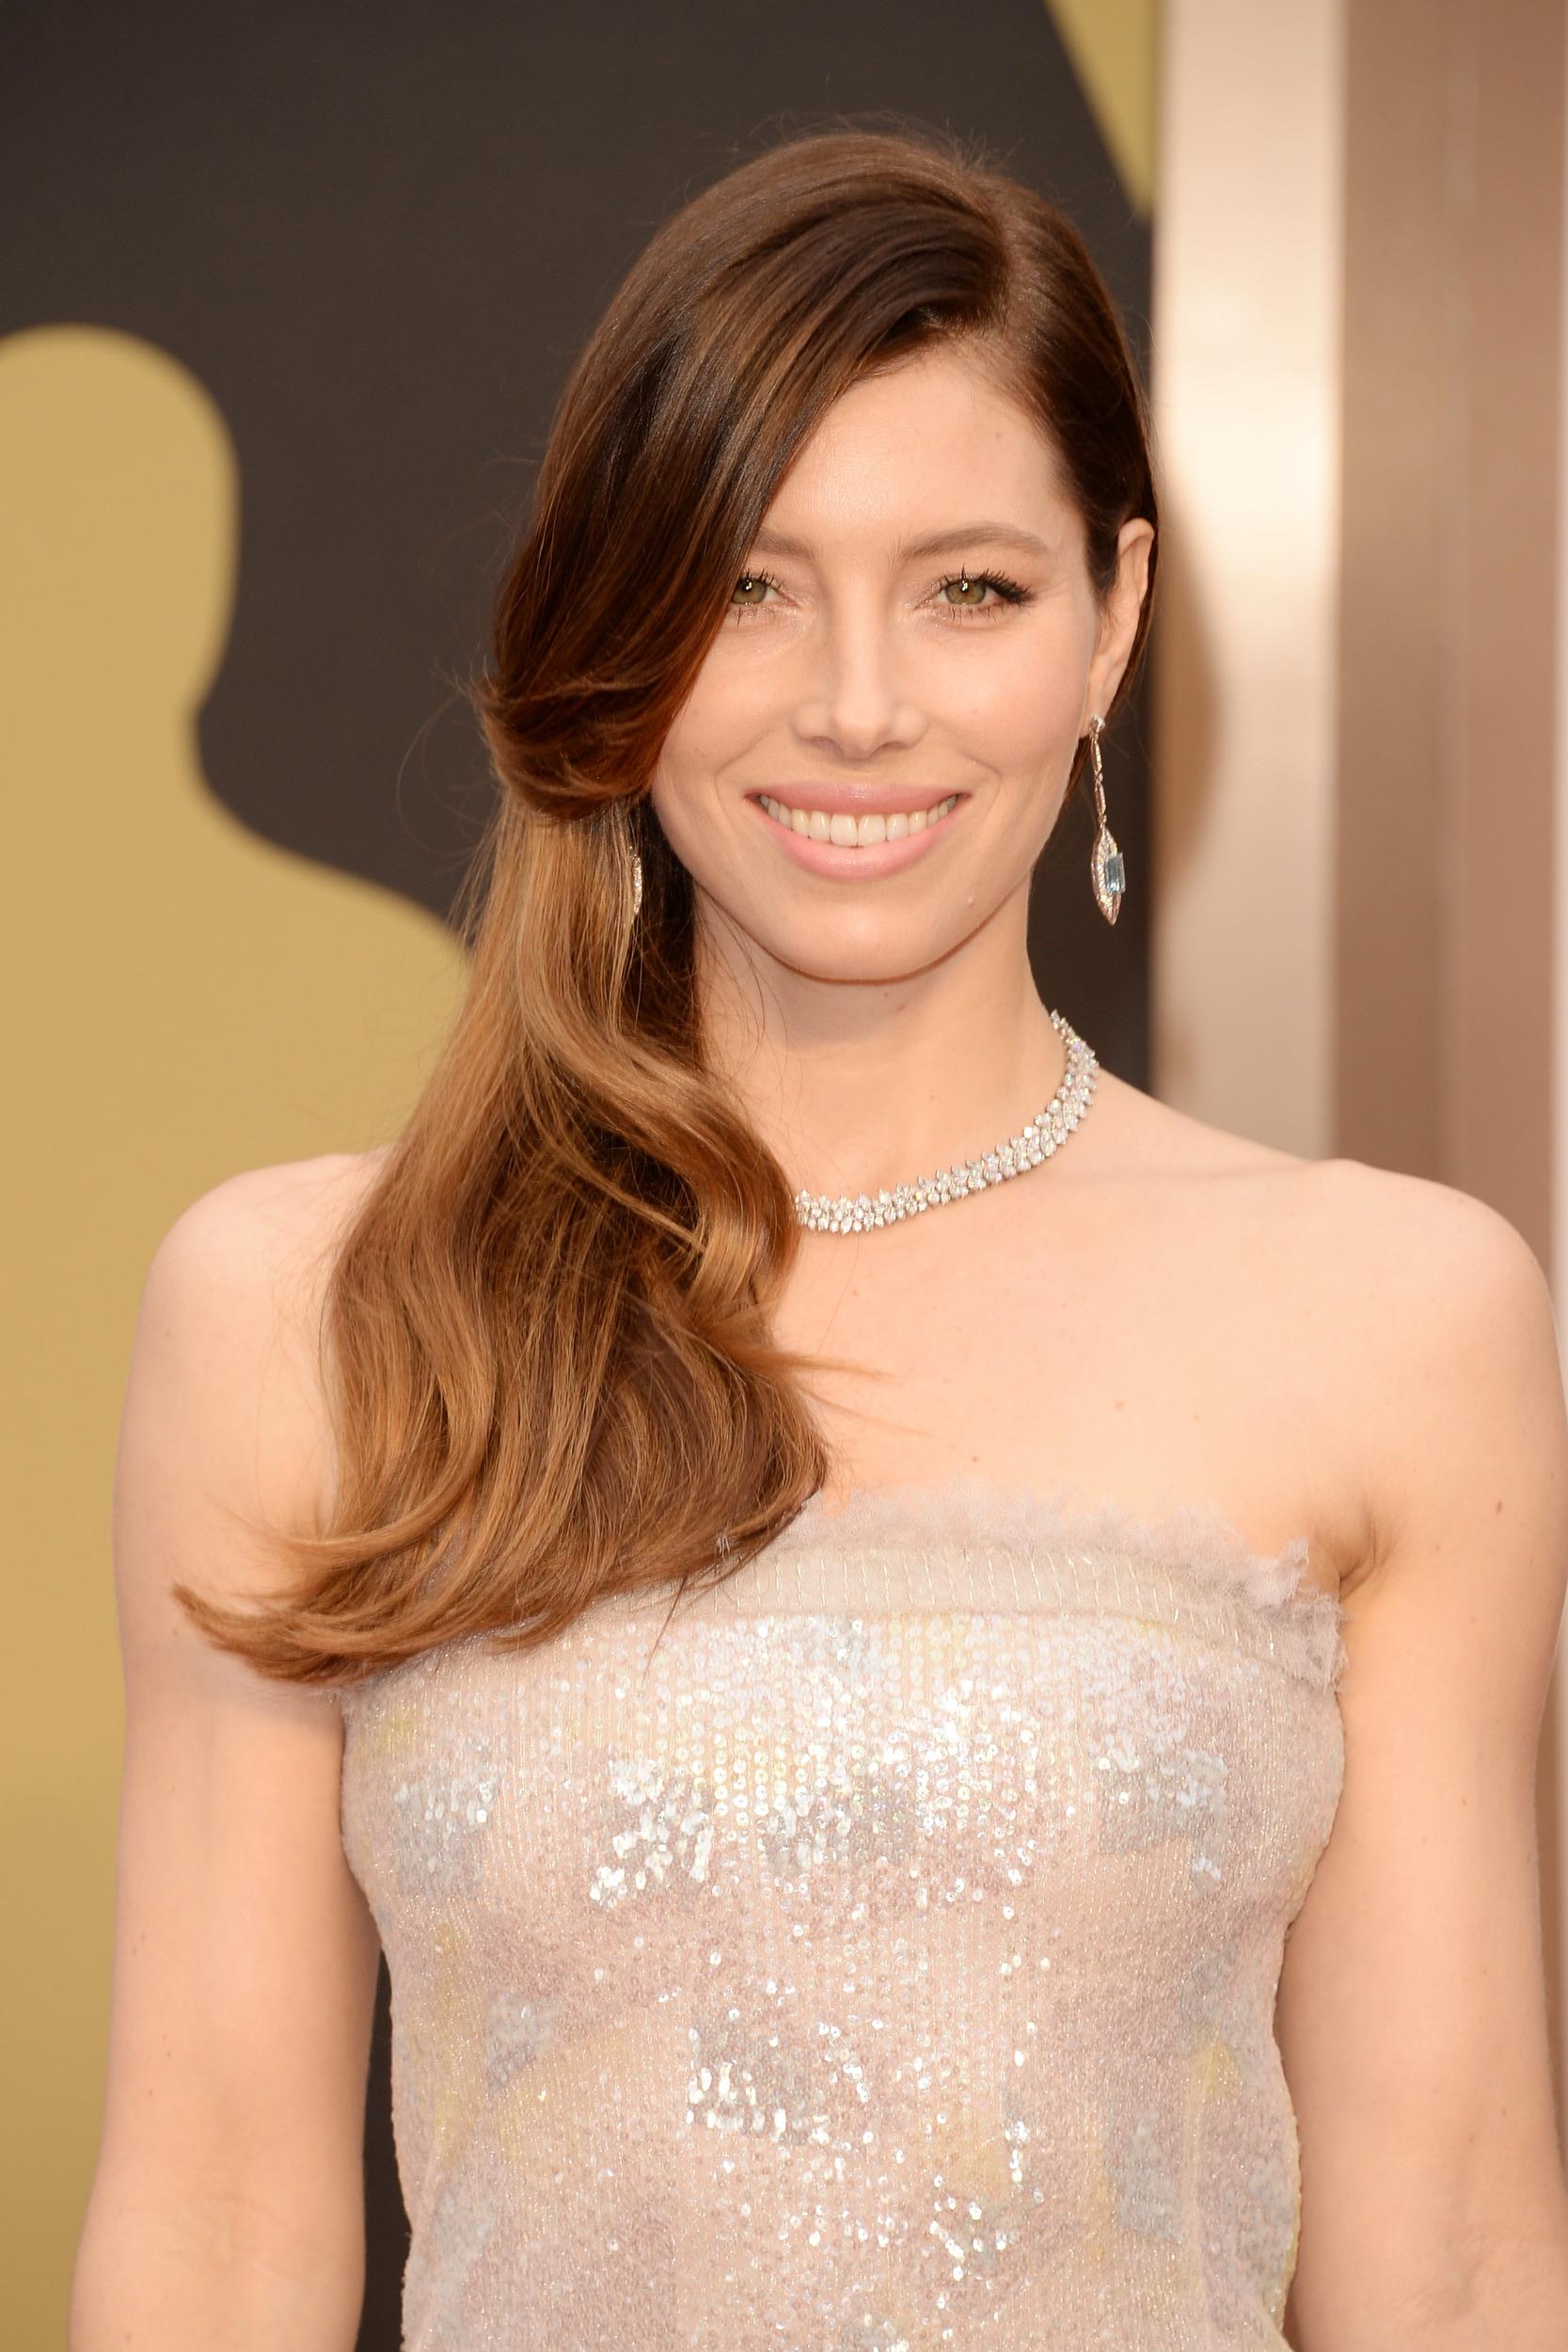 Jessica Biel diamond jewelry at Oscars 2014